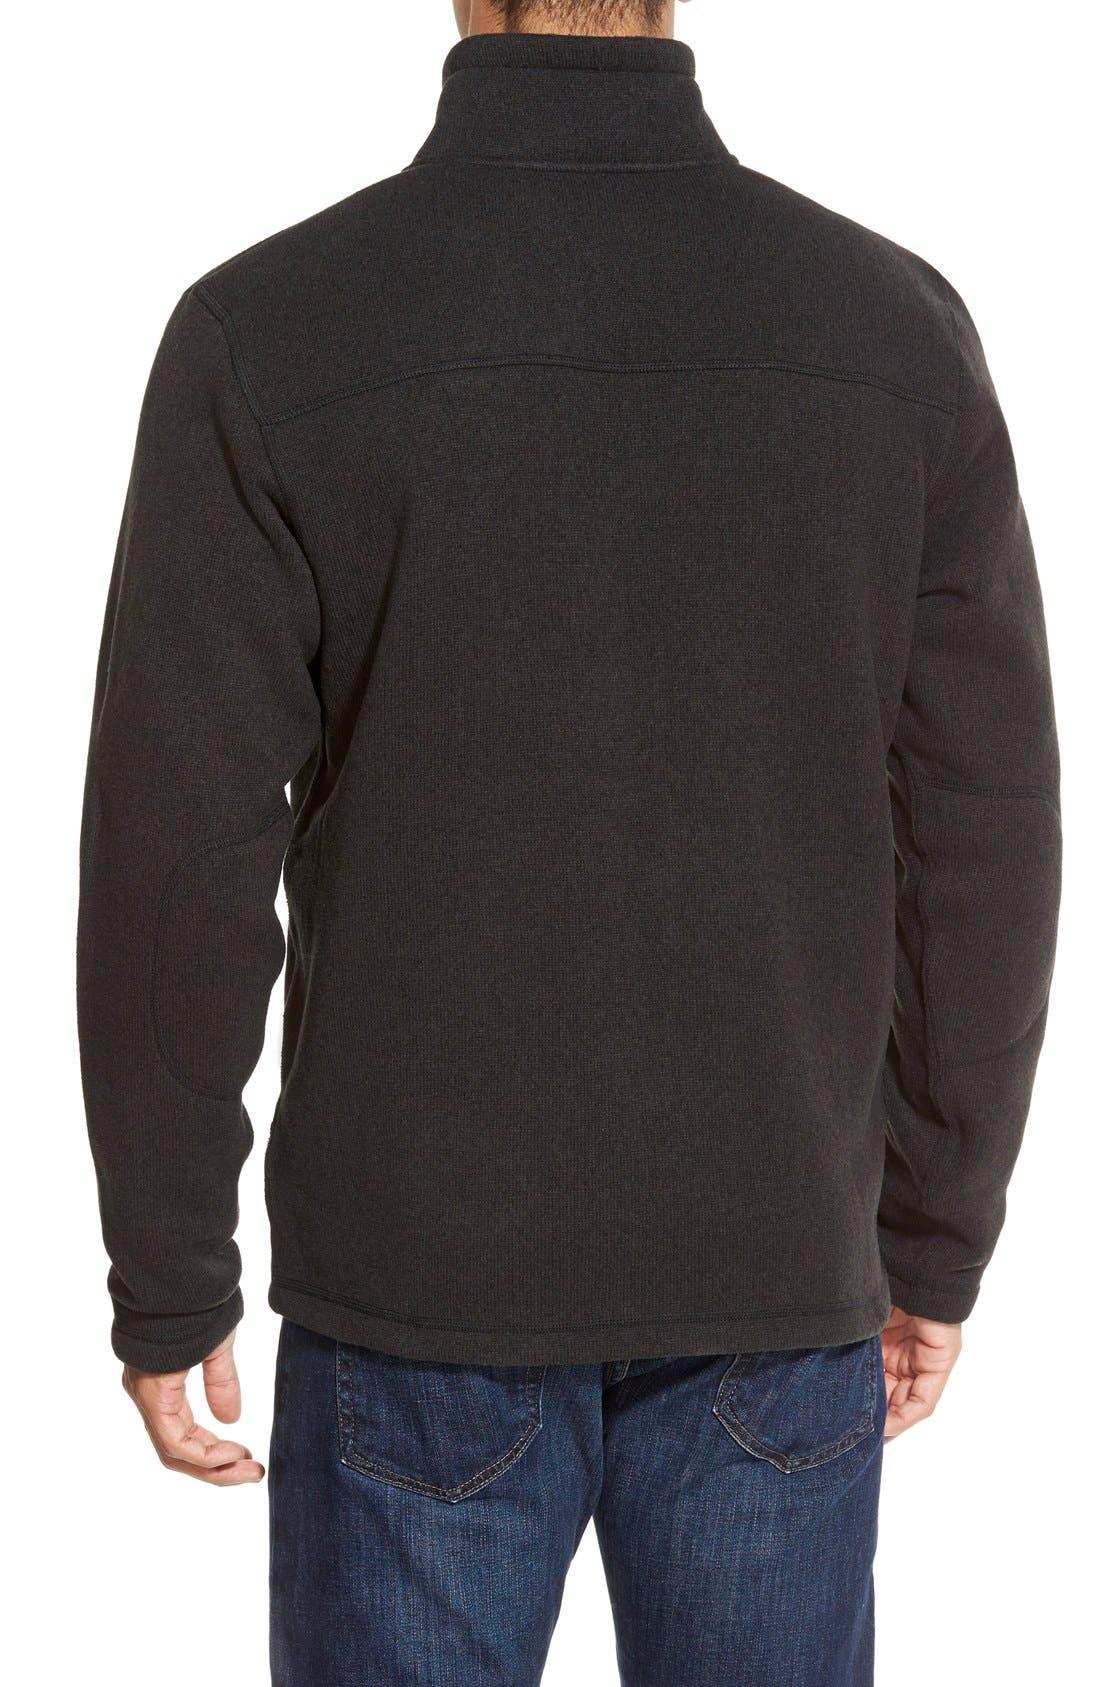 THE NORTH FACE,                             'Gordon Lyons' Zip Fleece Jacket,                             Alternate thumbnail 6, color,                             001